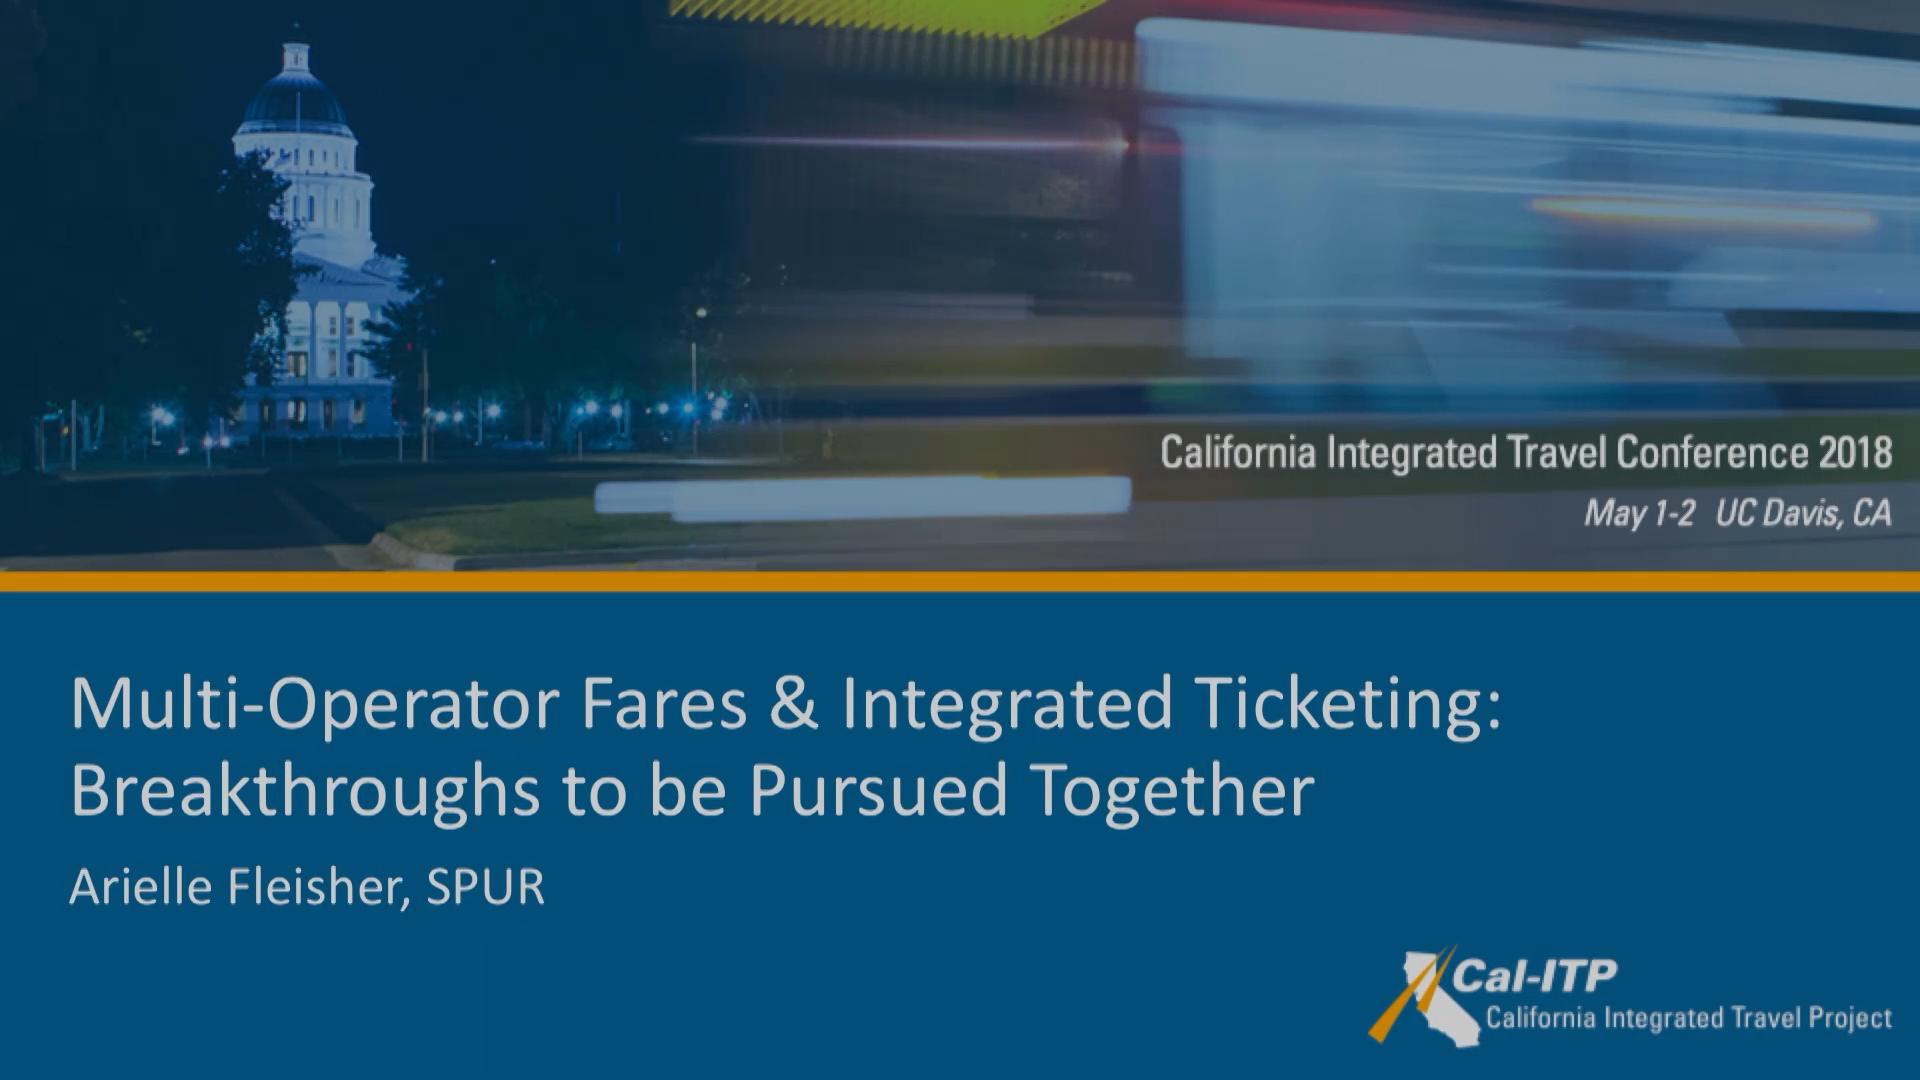 23. Multi-Operator Fares & Integrated Ticketing